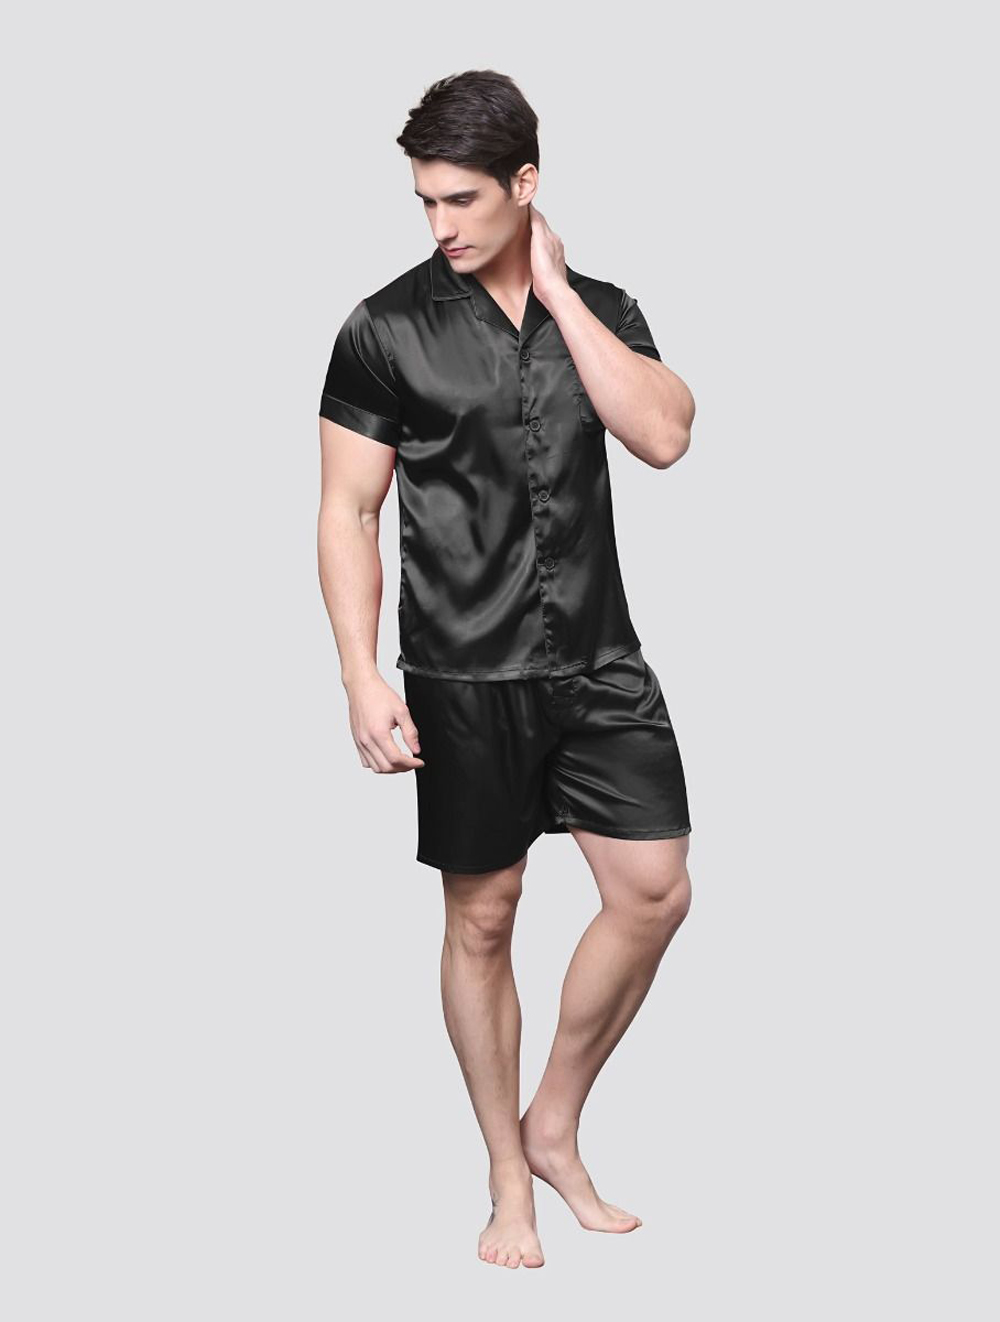 0d54cbd76 أحدث صيحات ملابس النوم الرجالي لهذا العام – ِArab Luxury Life